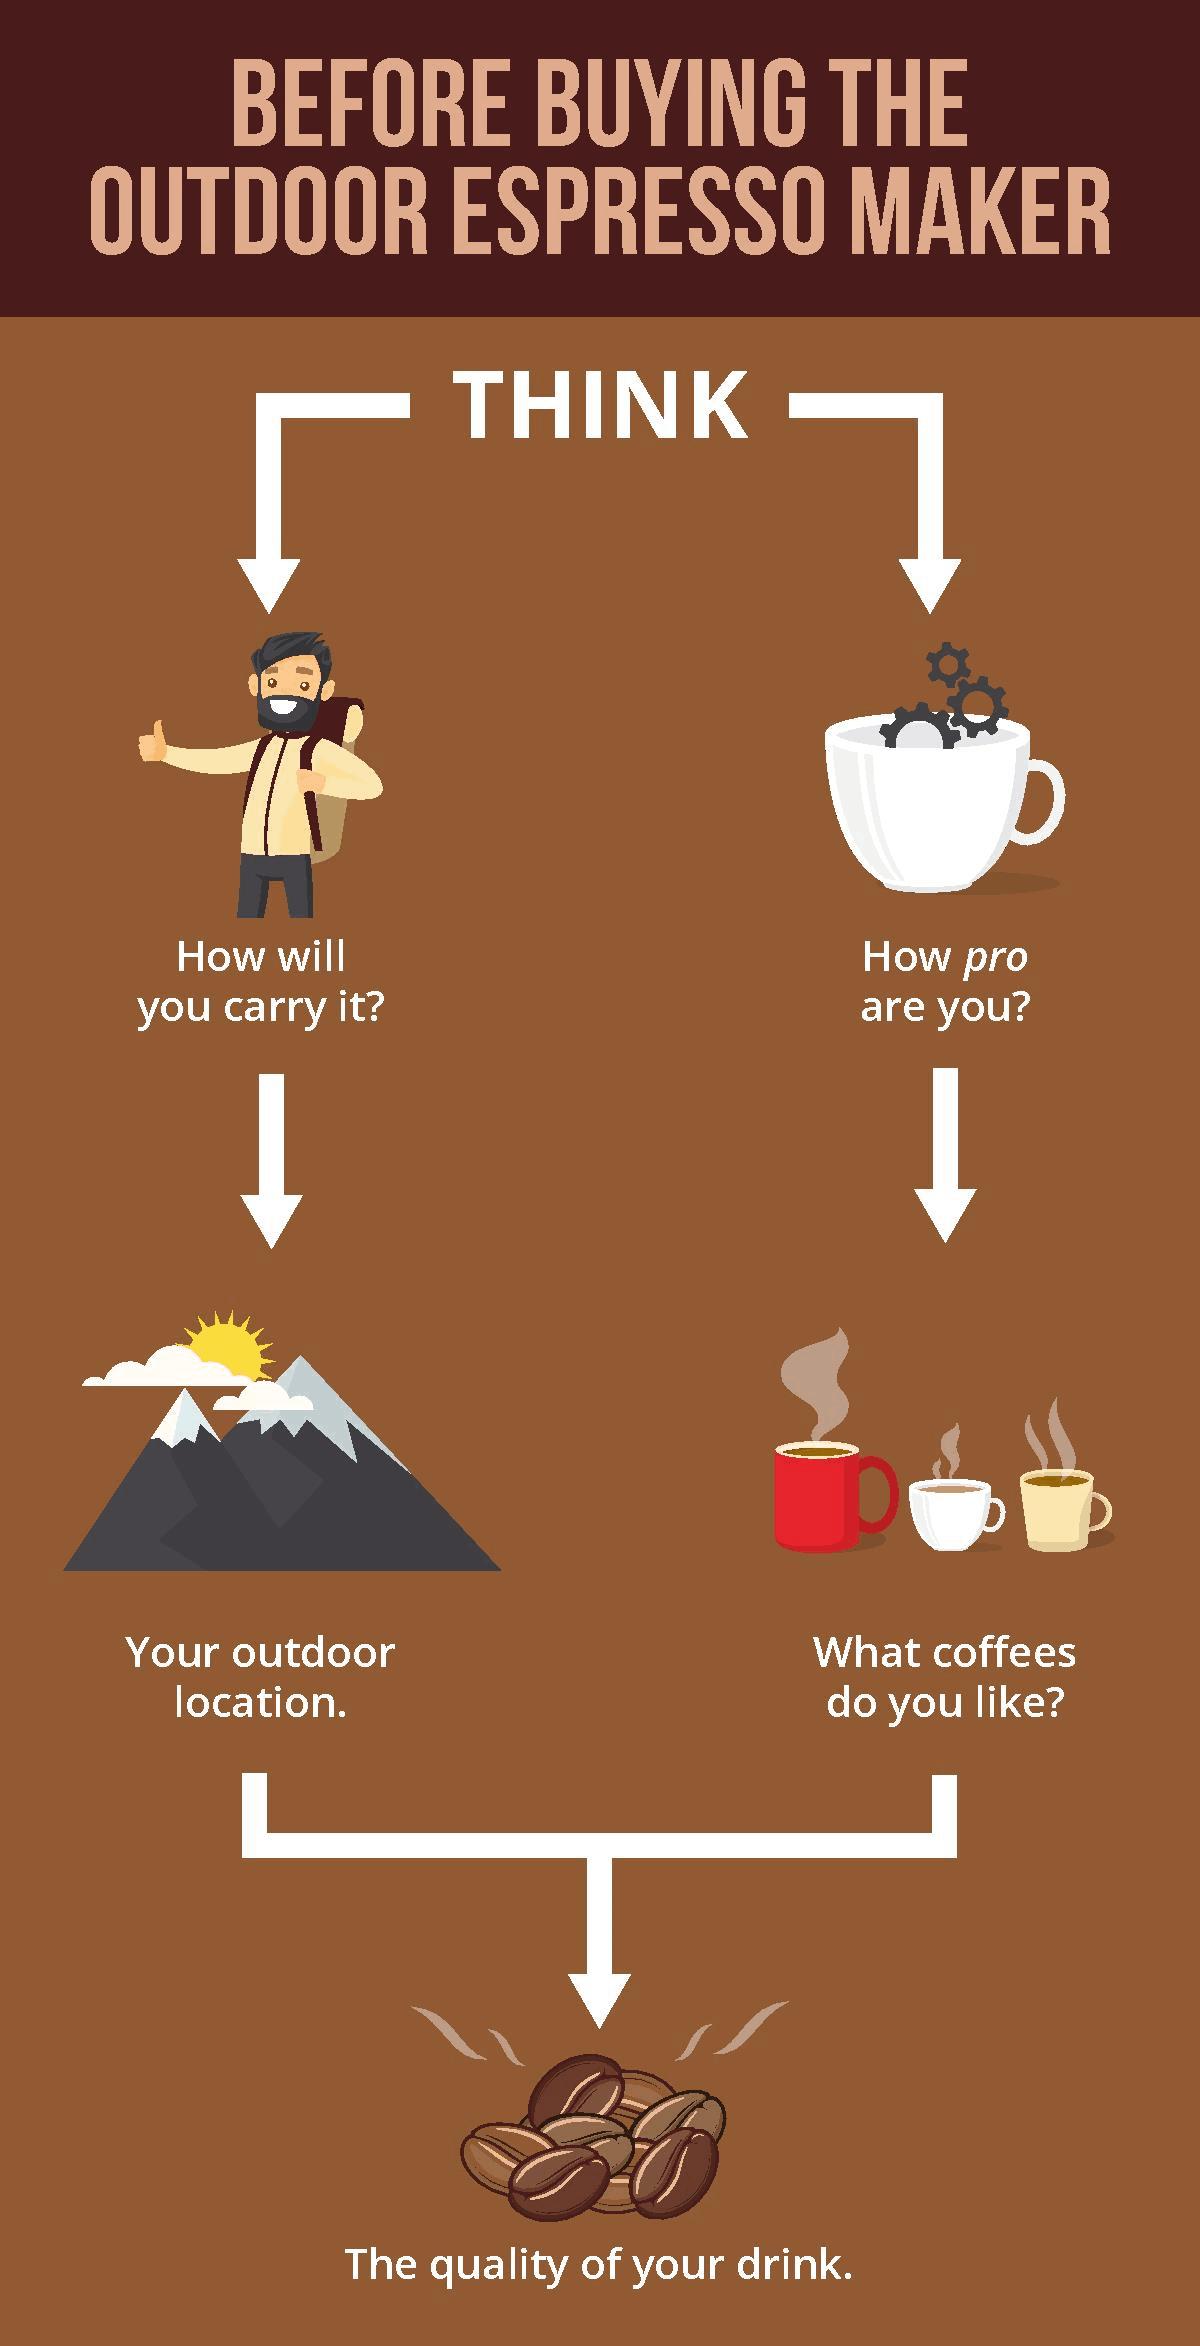 Buyer's Guide for Espresso Maker